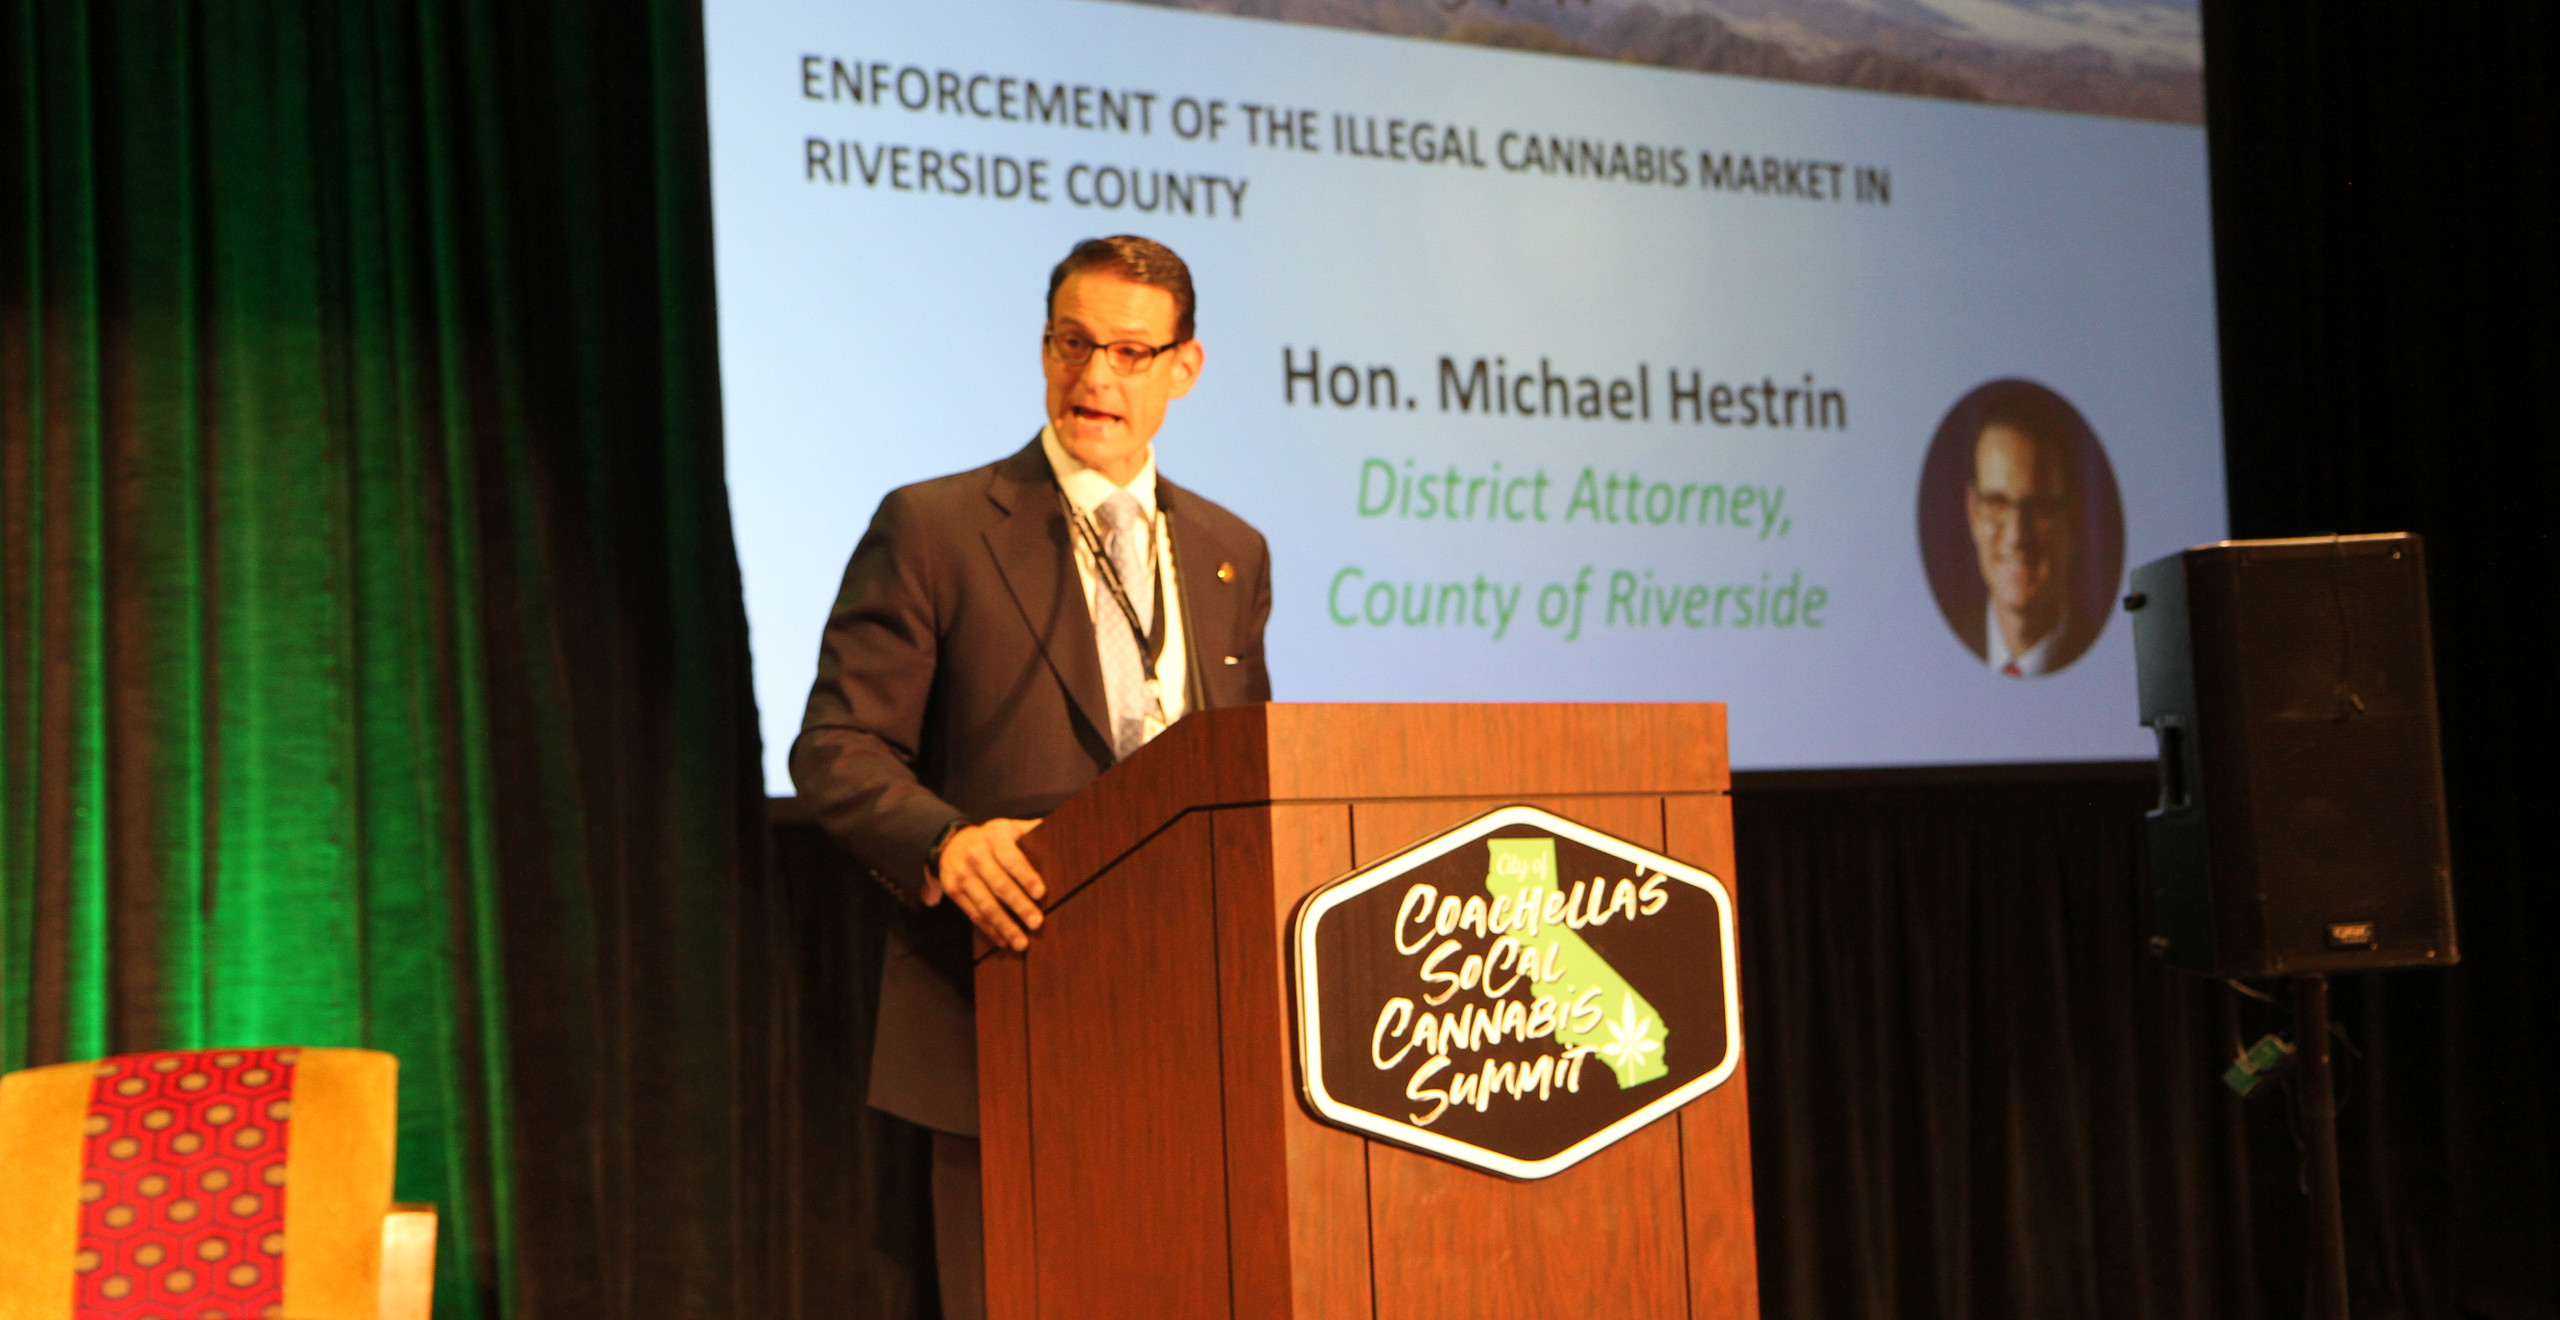 Riverside County District Attorney Michael Hestrin